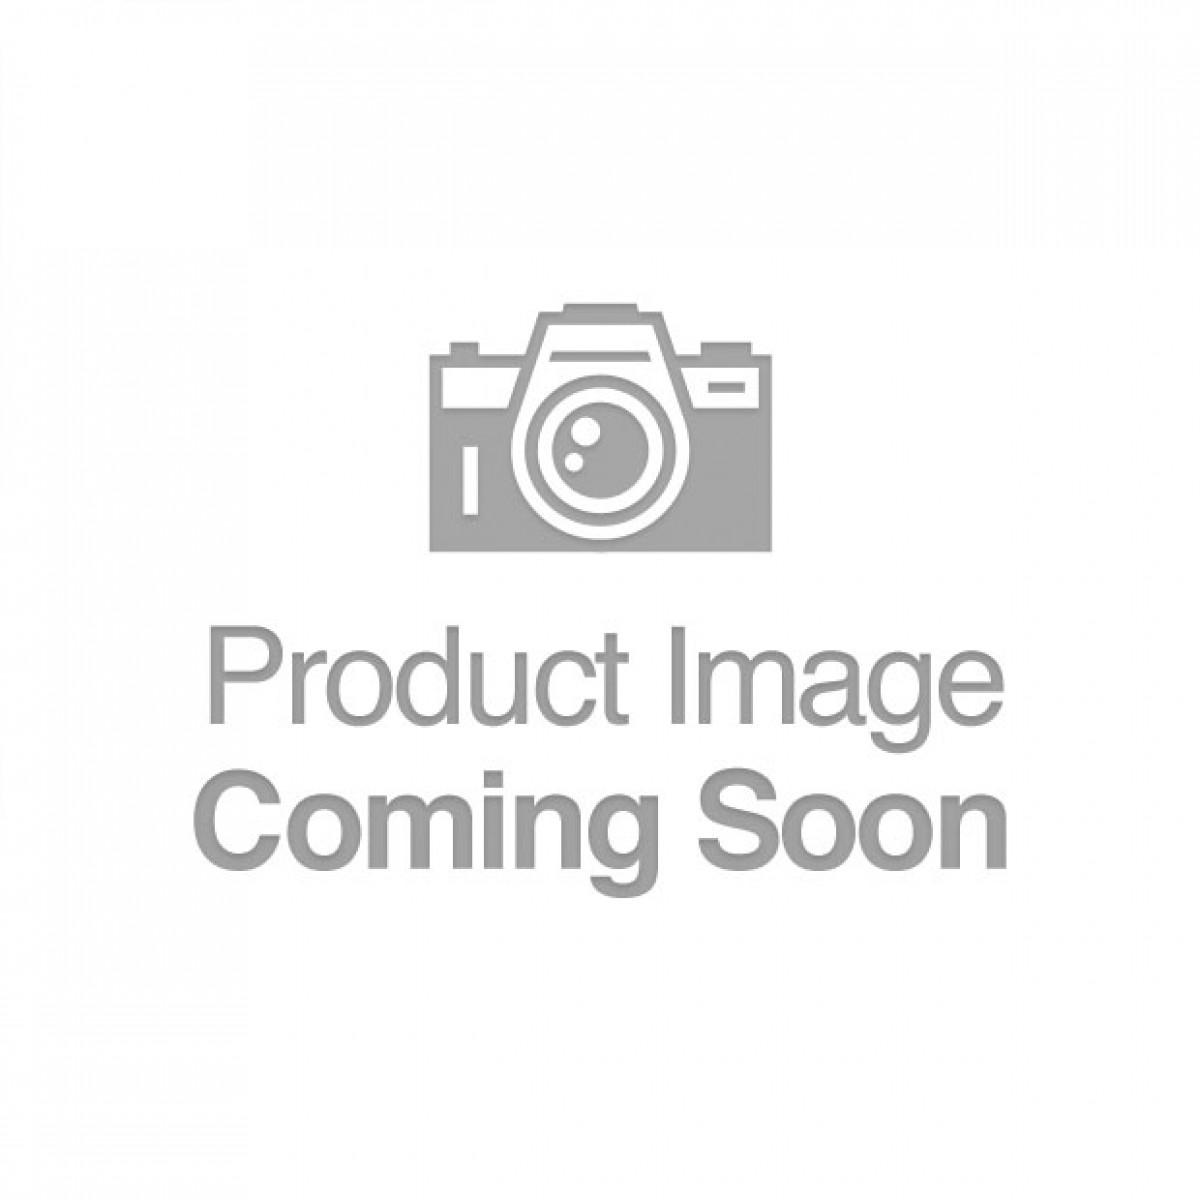 She-ology Interchangeable Weighted Kegel Set